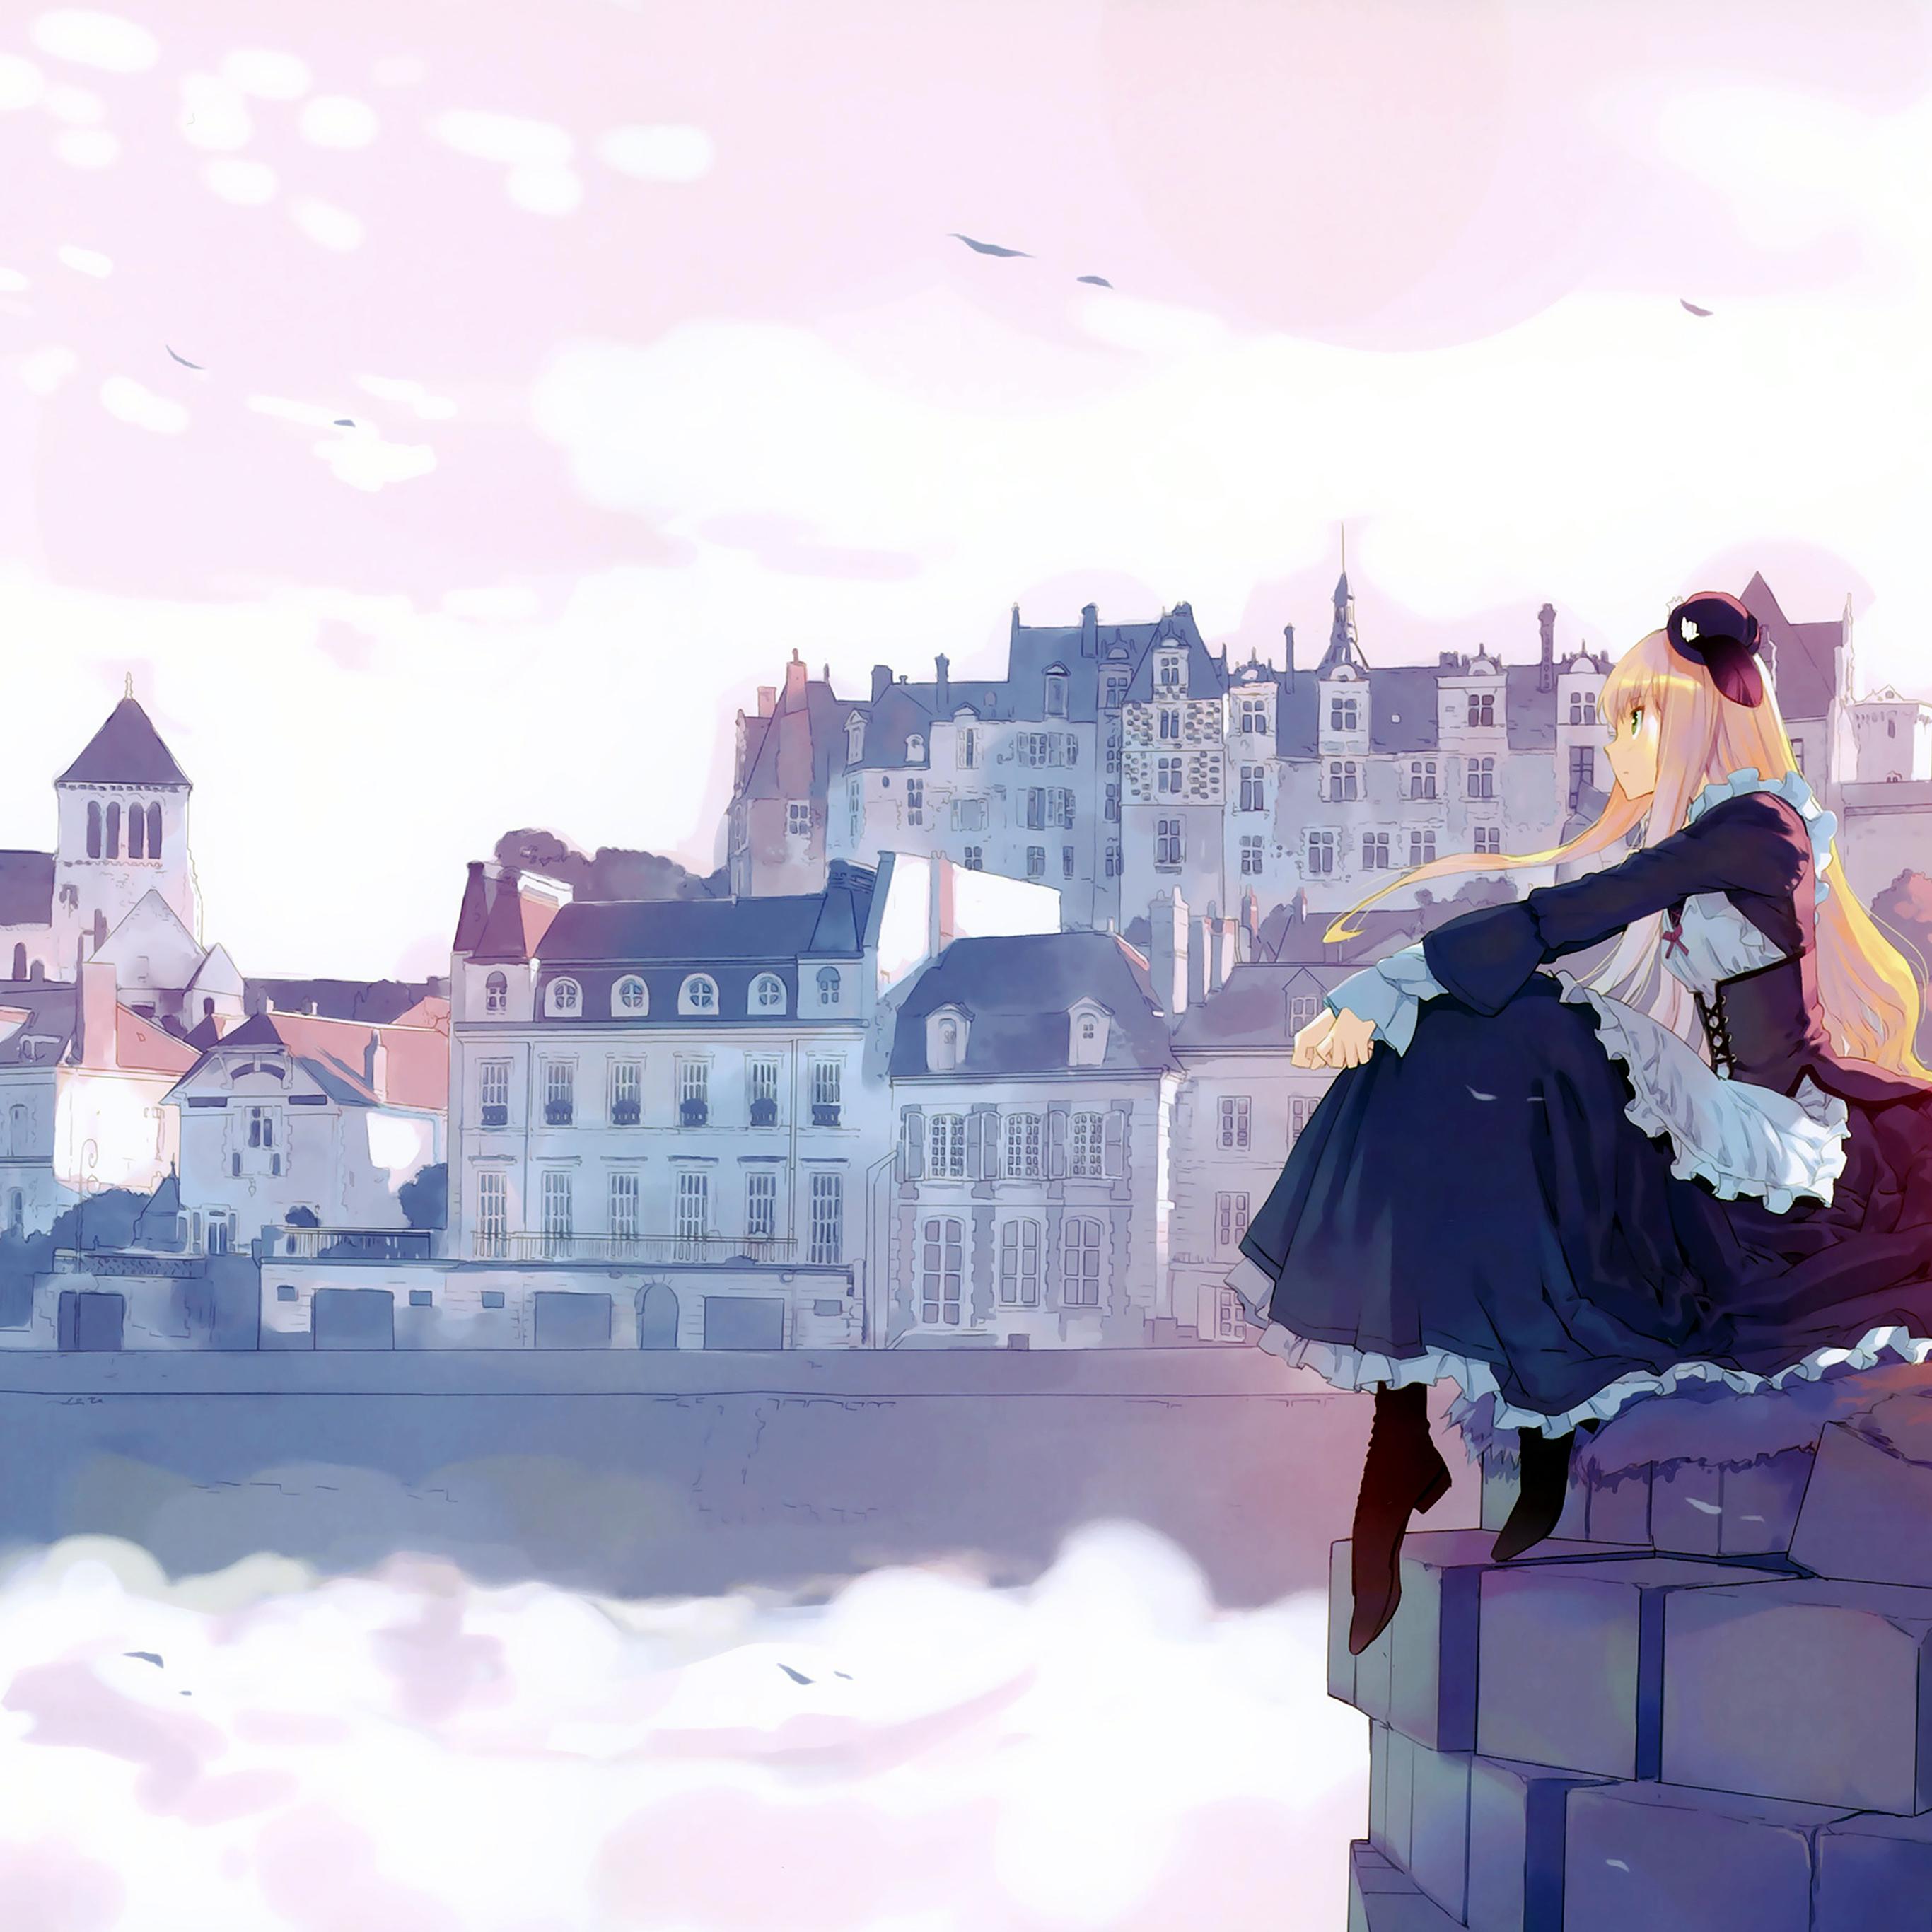 aj45 anime thinking girl lake illust art Papers